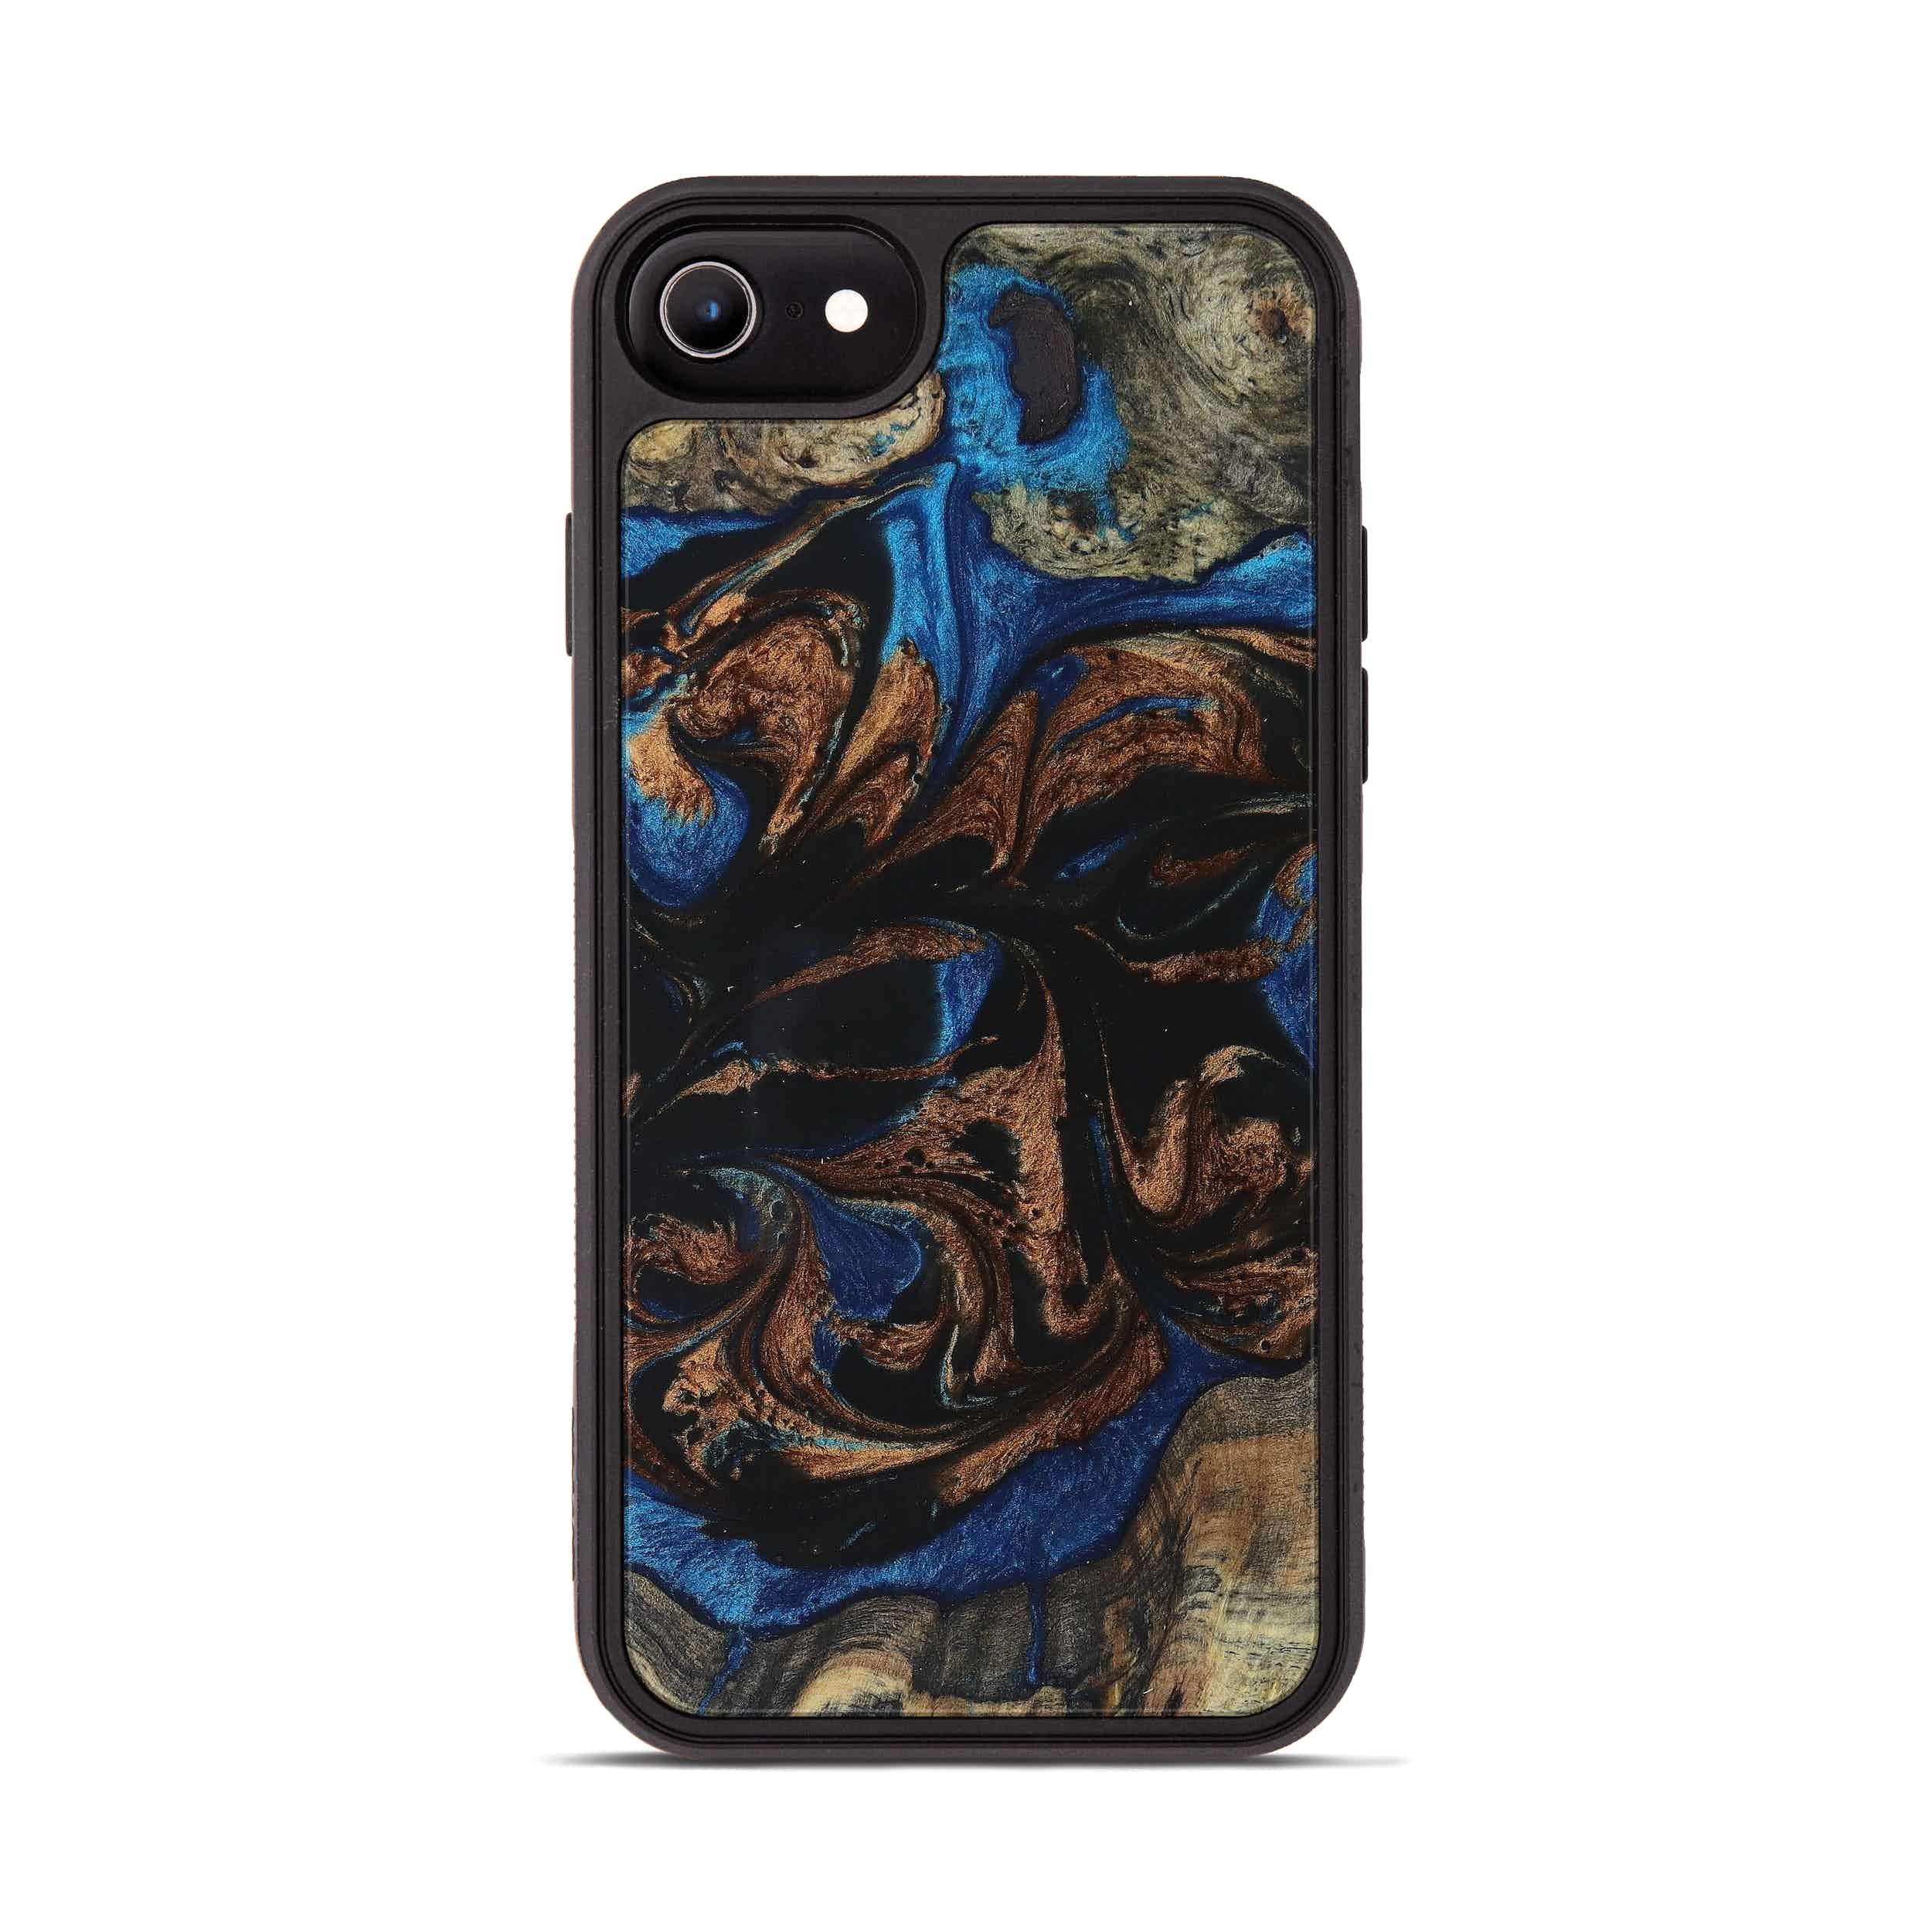 iPhone 8 Wood+Resin Phone Case - Jillian (Teal & Gold, 394561)